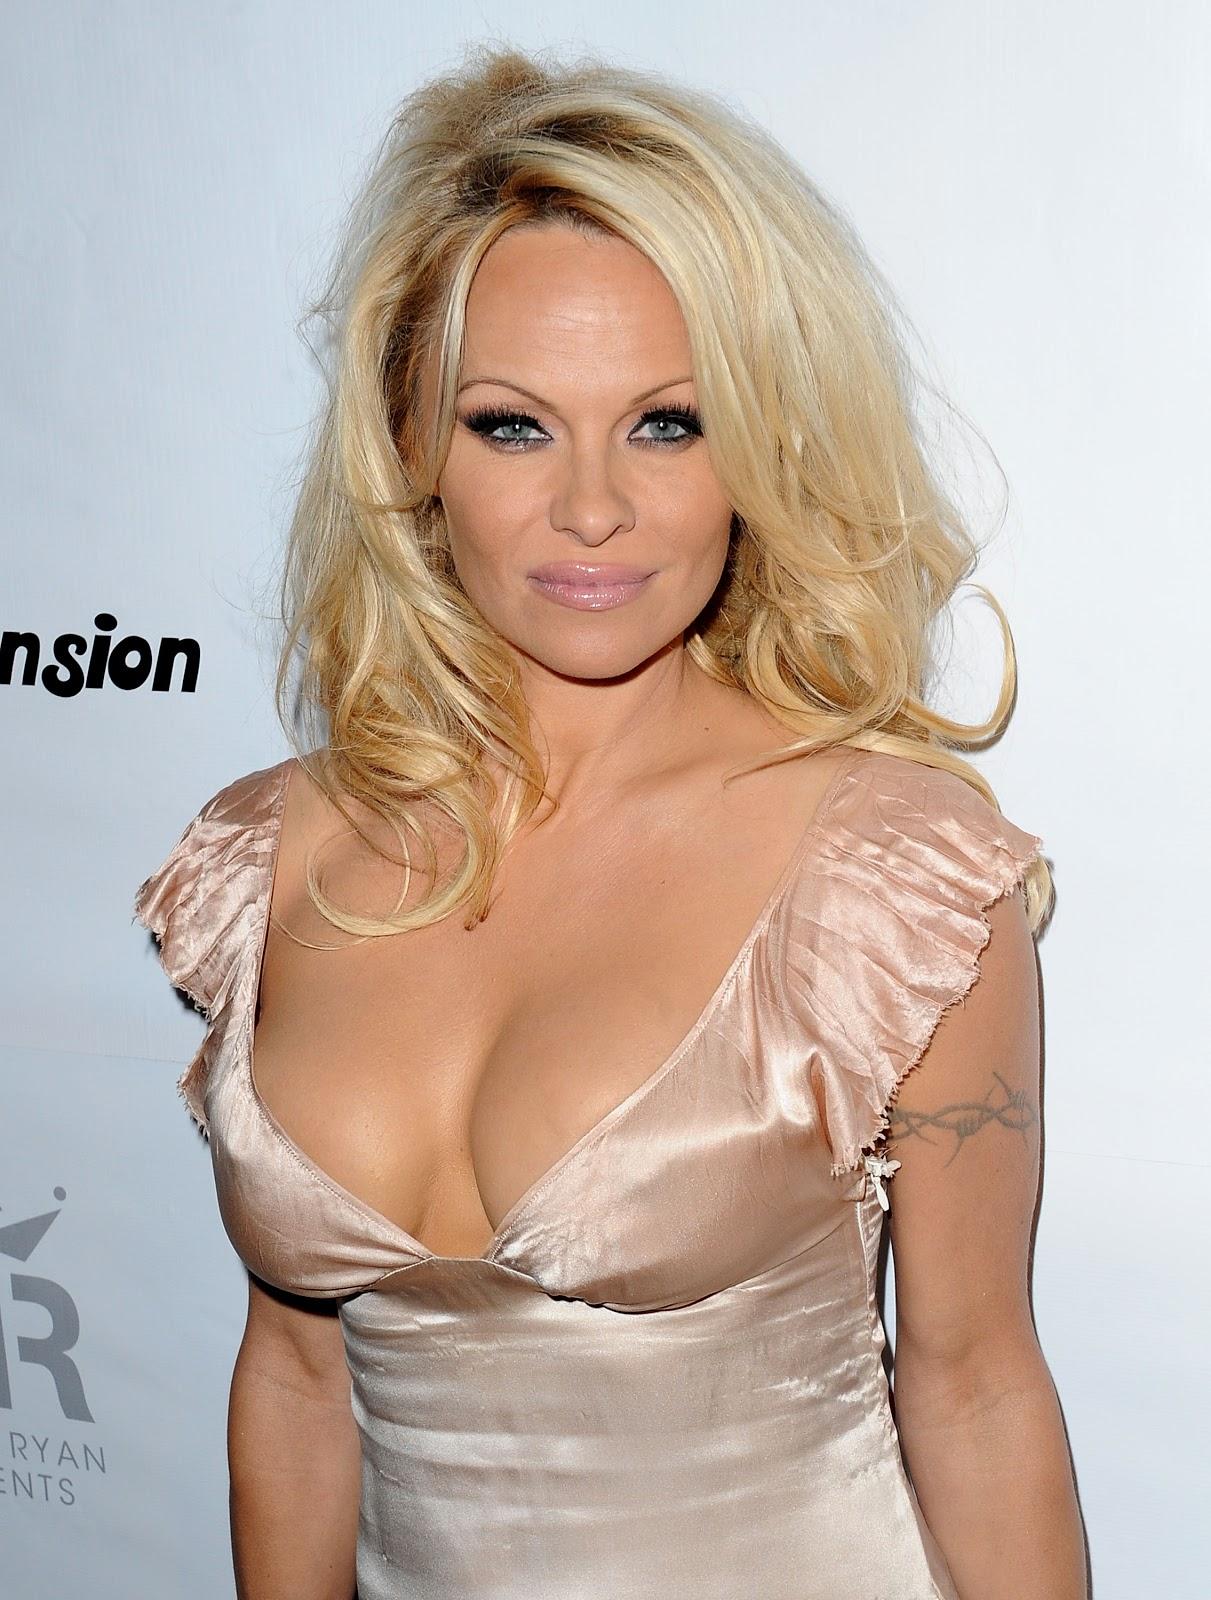 http://1.bp.blogspot.com/-rvw-9CKFllk/UKZTBJRpebI/AAAAAAAADv4/8YrKb6-lHIc/s1600/Pamela+Anderson+New+Hot+Pic+2012-2013+10.jpg